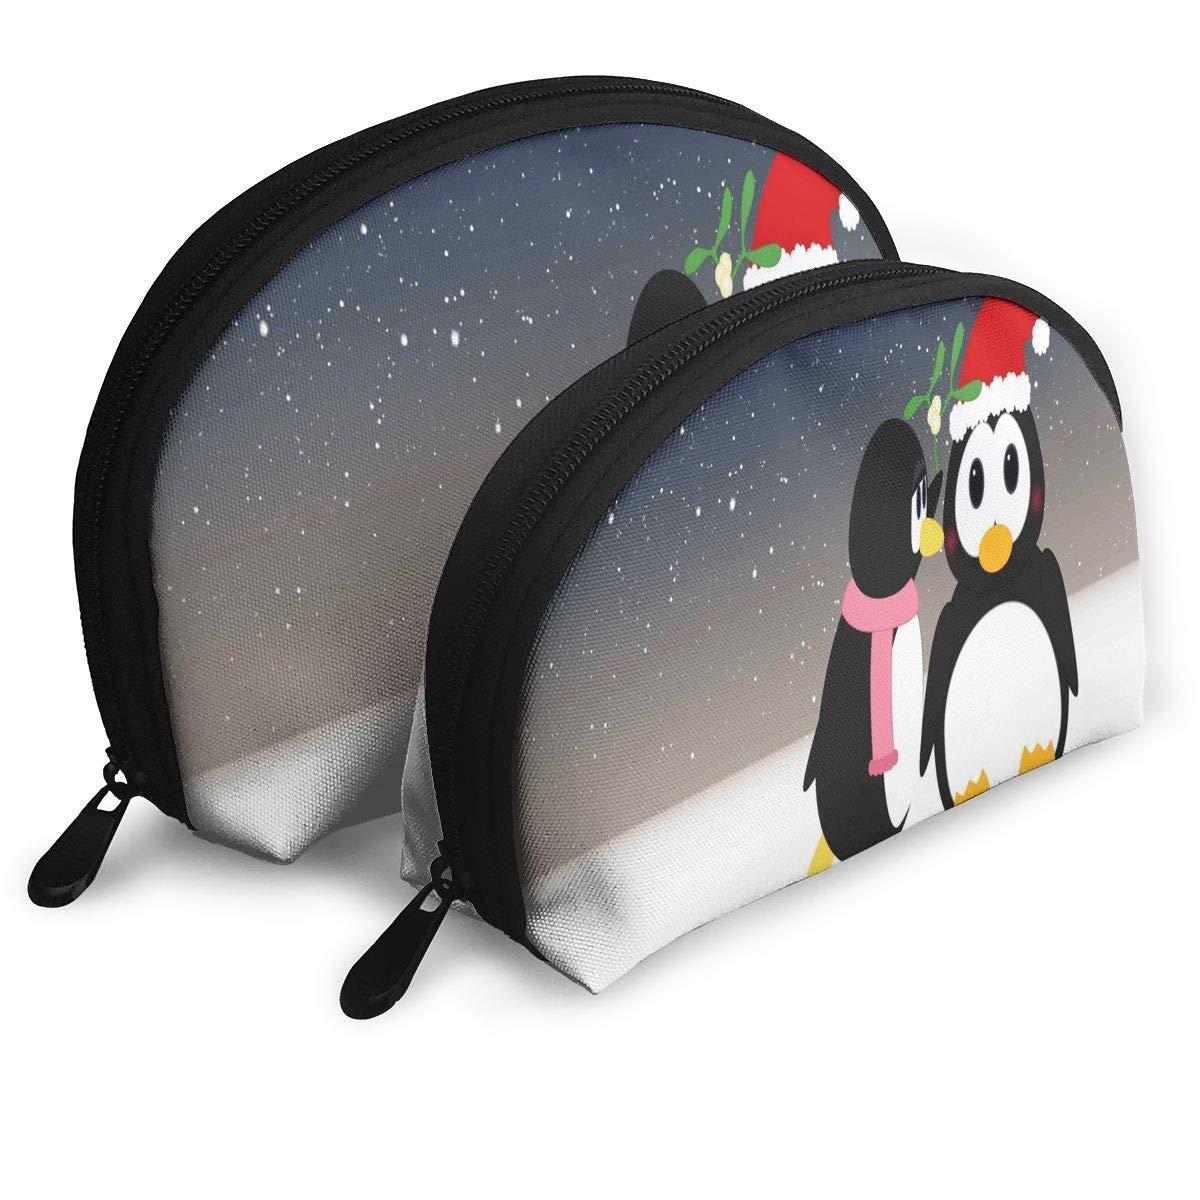 Pouch Zipper Toiletry Organizer Travel Makeup Clutch Bag Two Penguins Portable Storage Bags